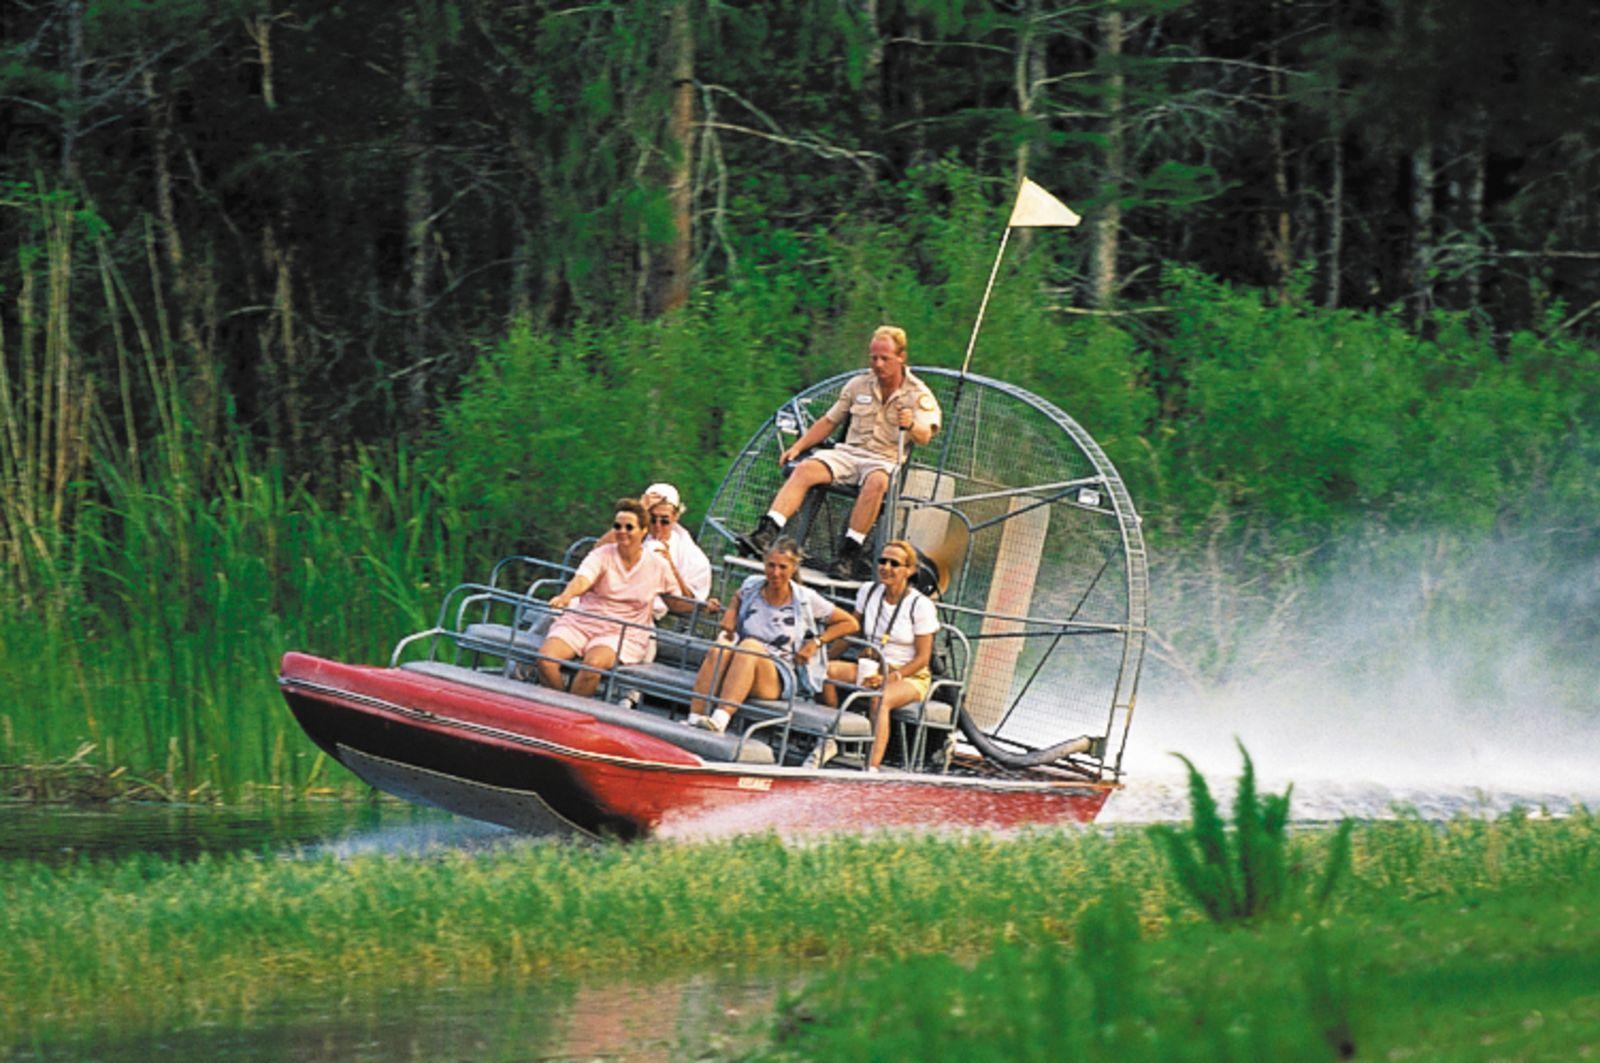 Airboat-Fahrt in den Everglades bei Fort Lauderdale, Florida